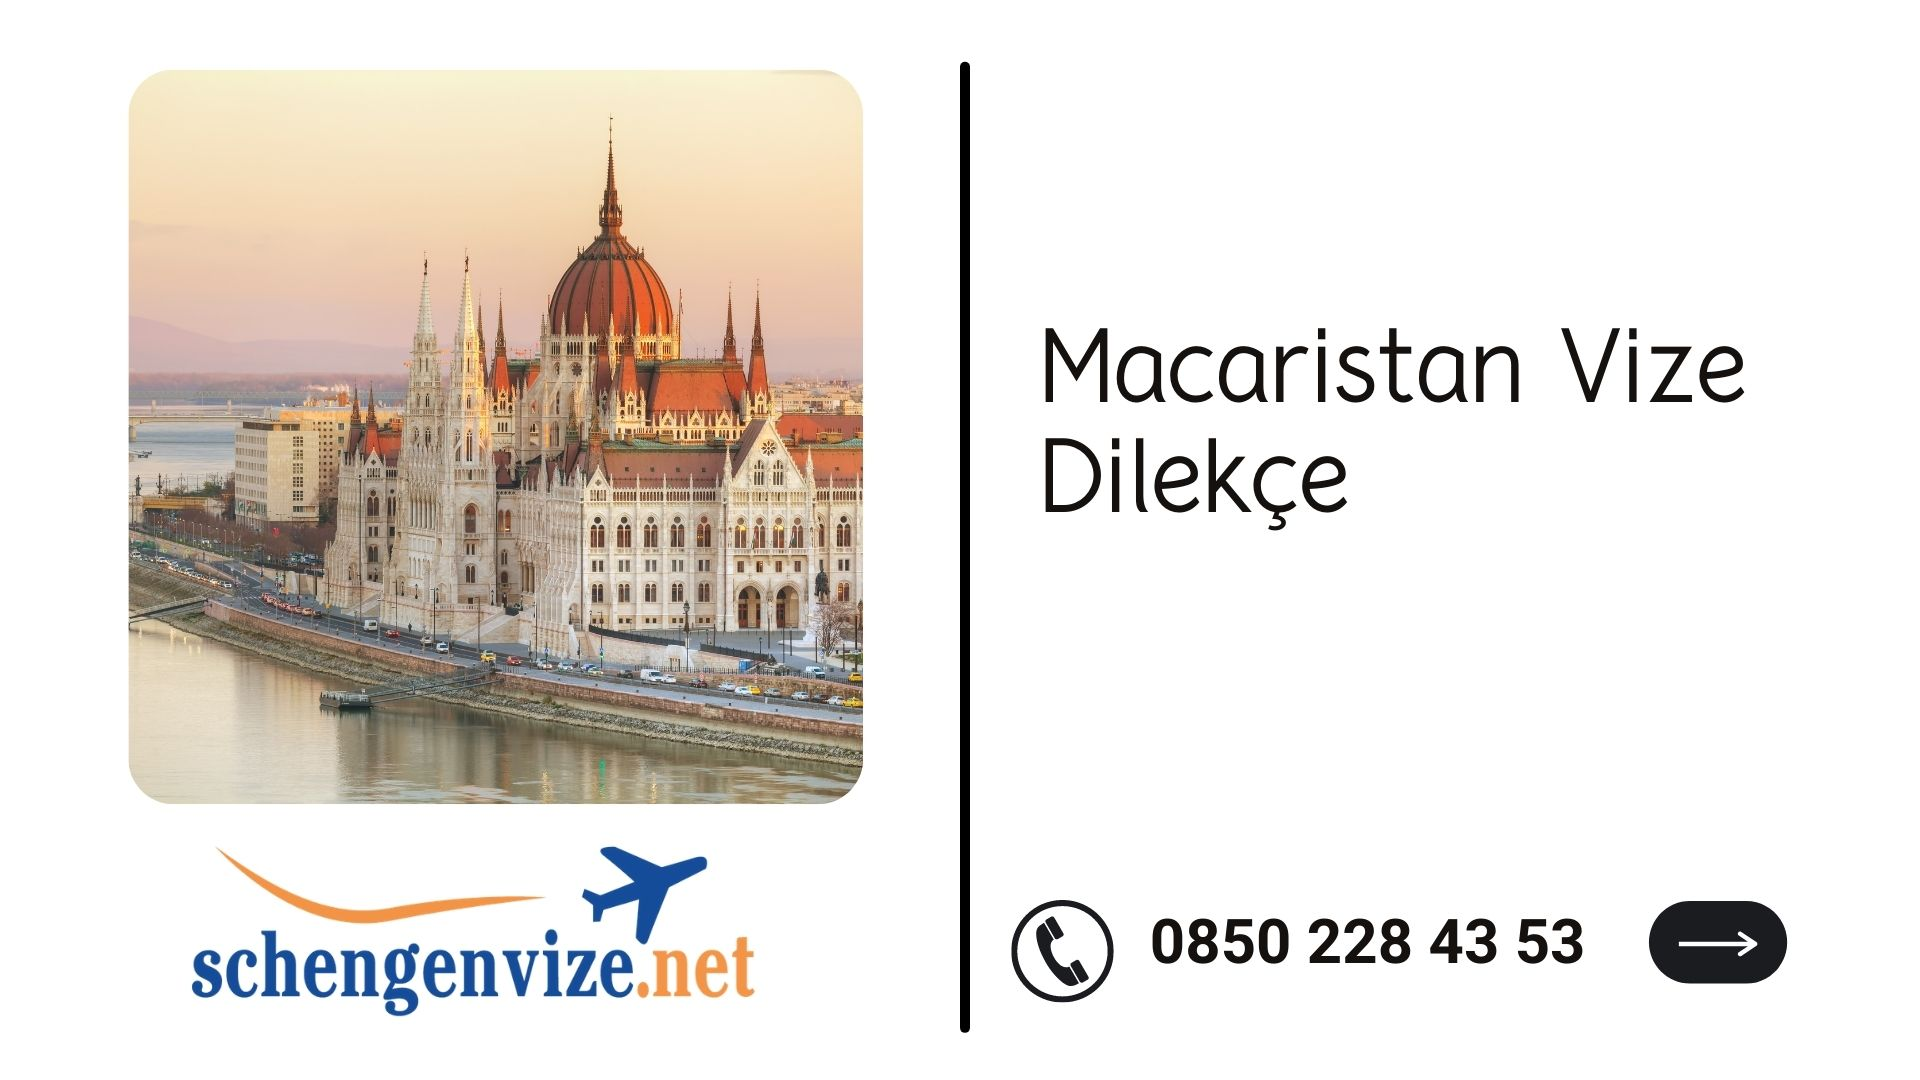 Macaristan Vize Dilekçe